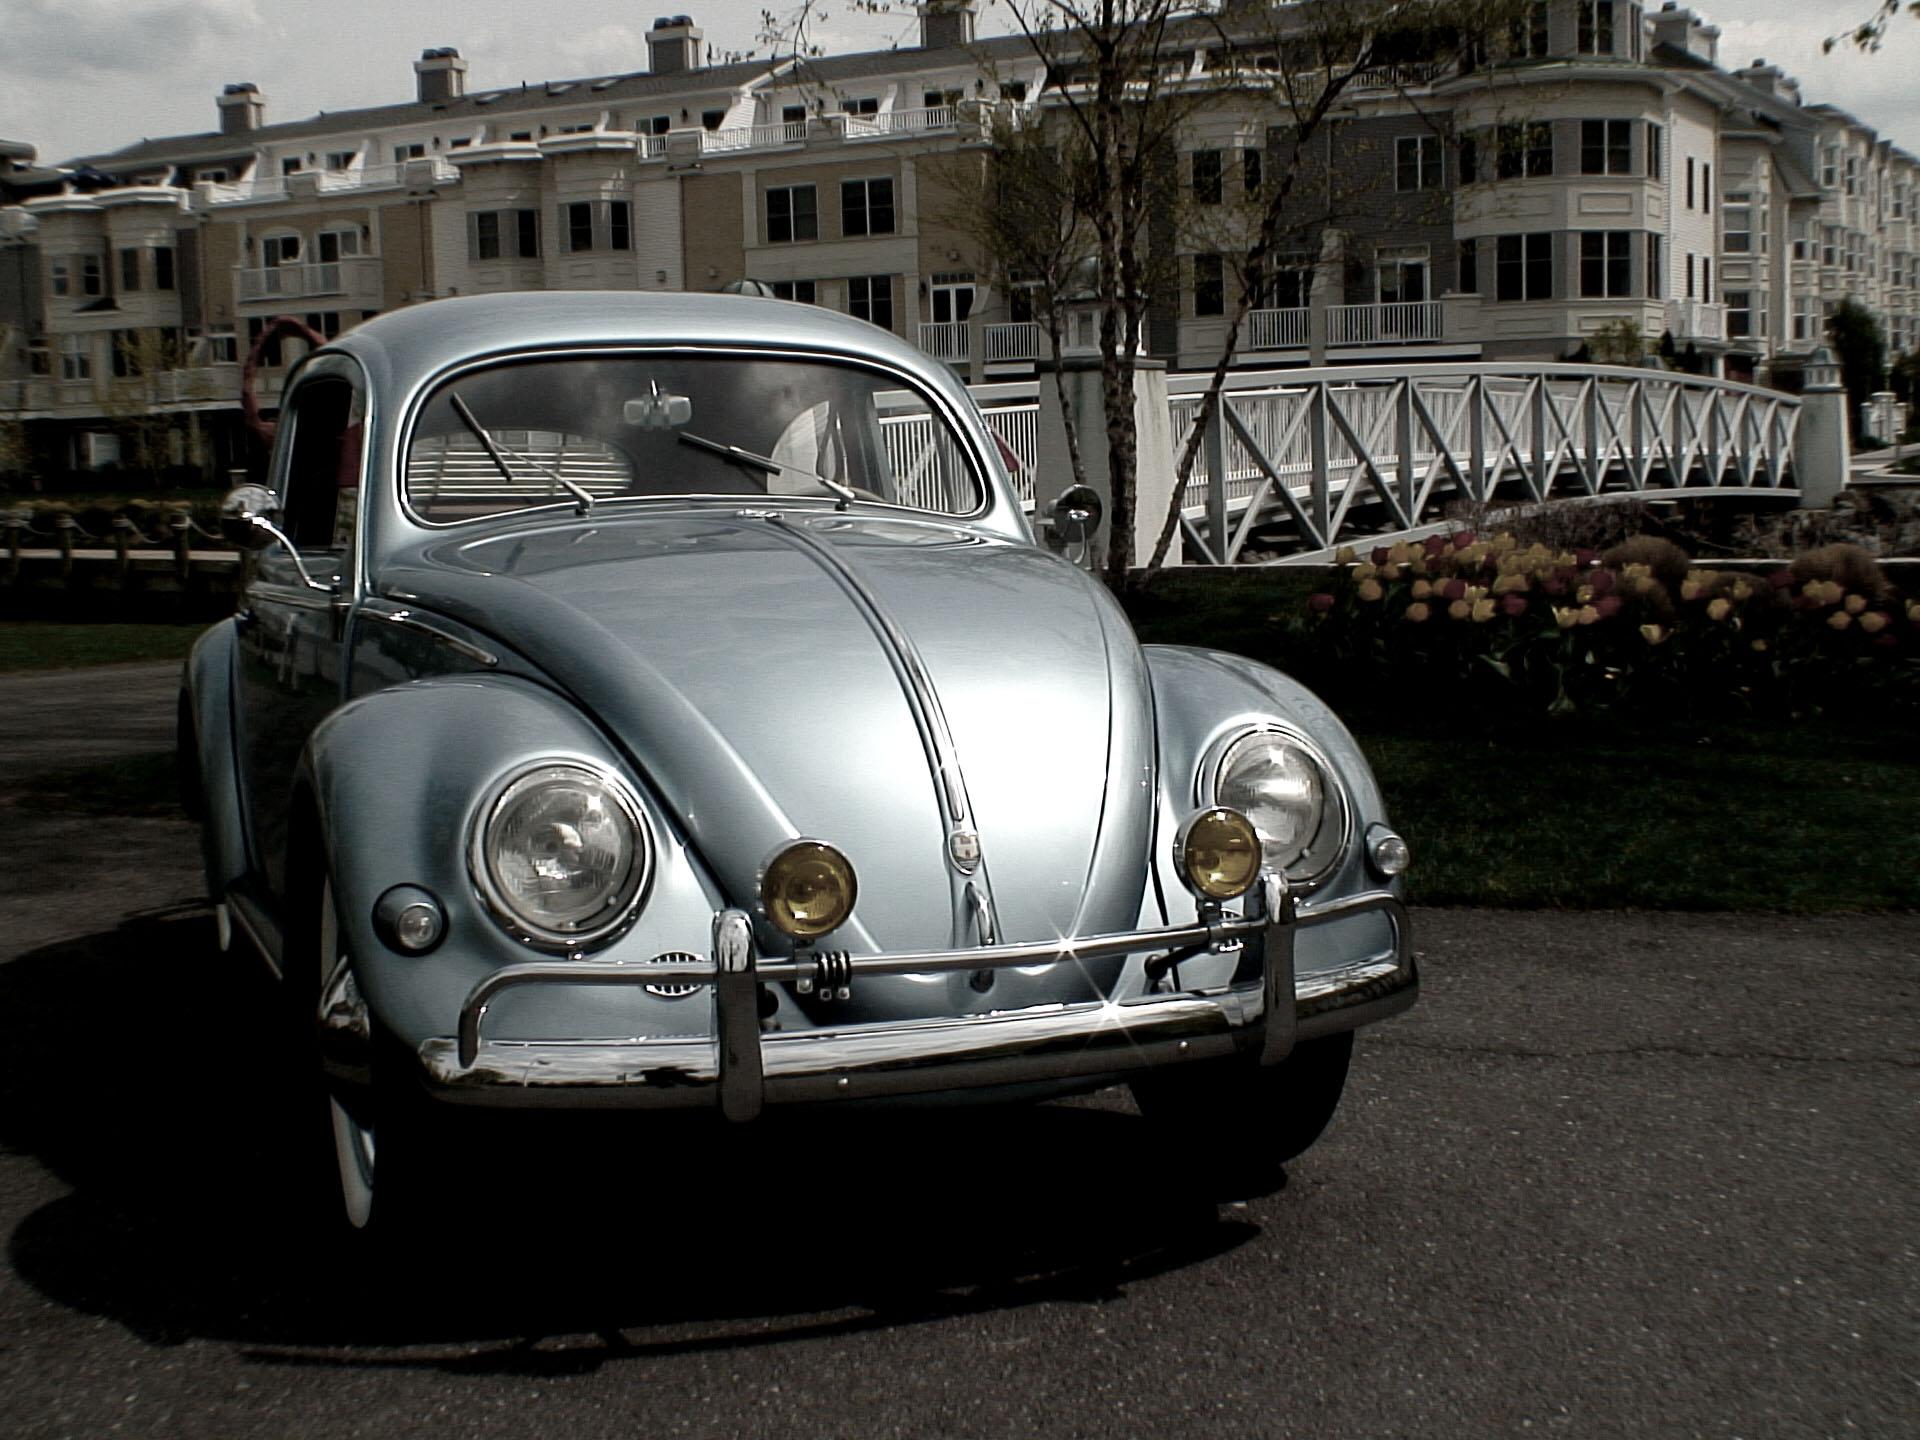 classic vw bugs chris vallones works  art   volkswagen beetle wall vintage type